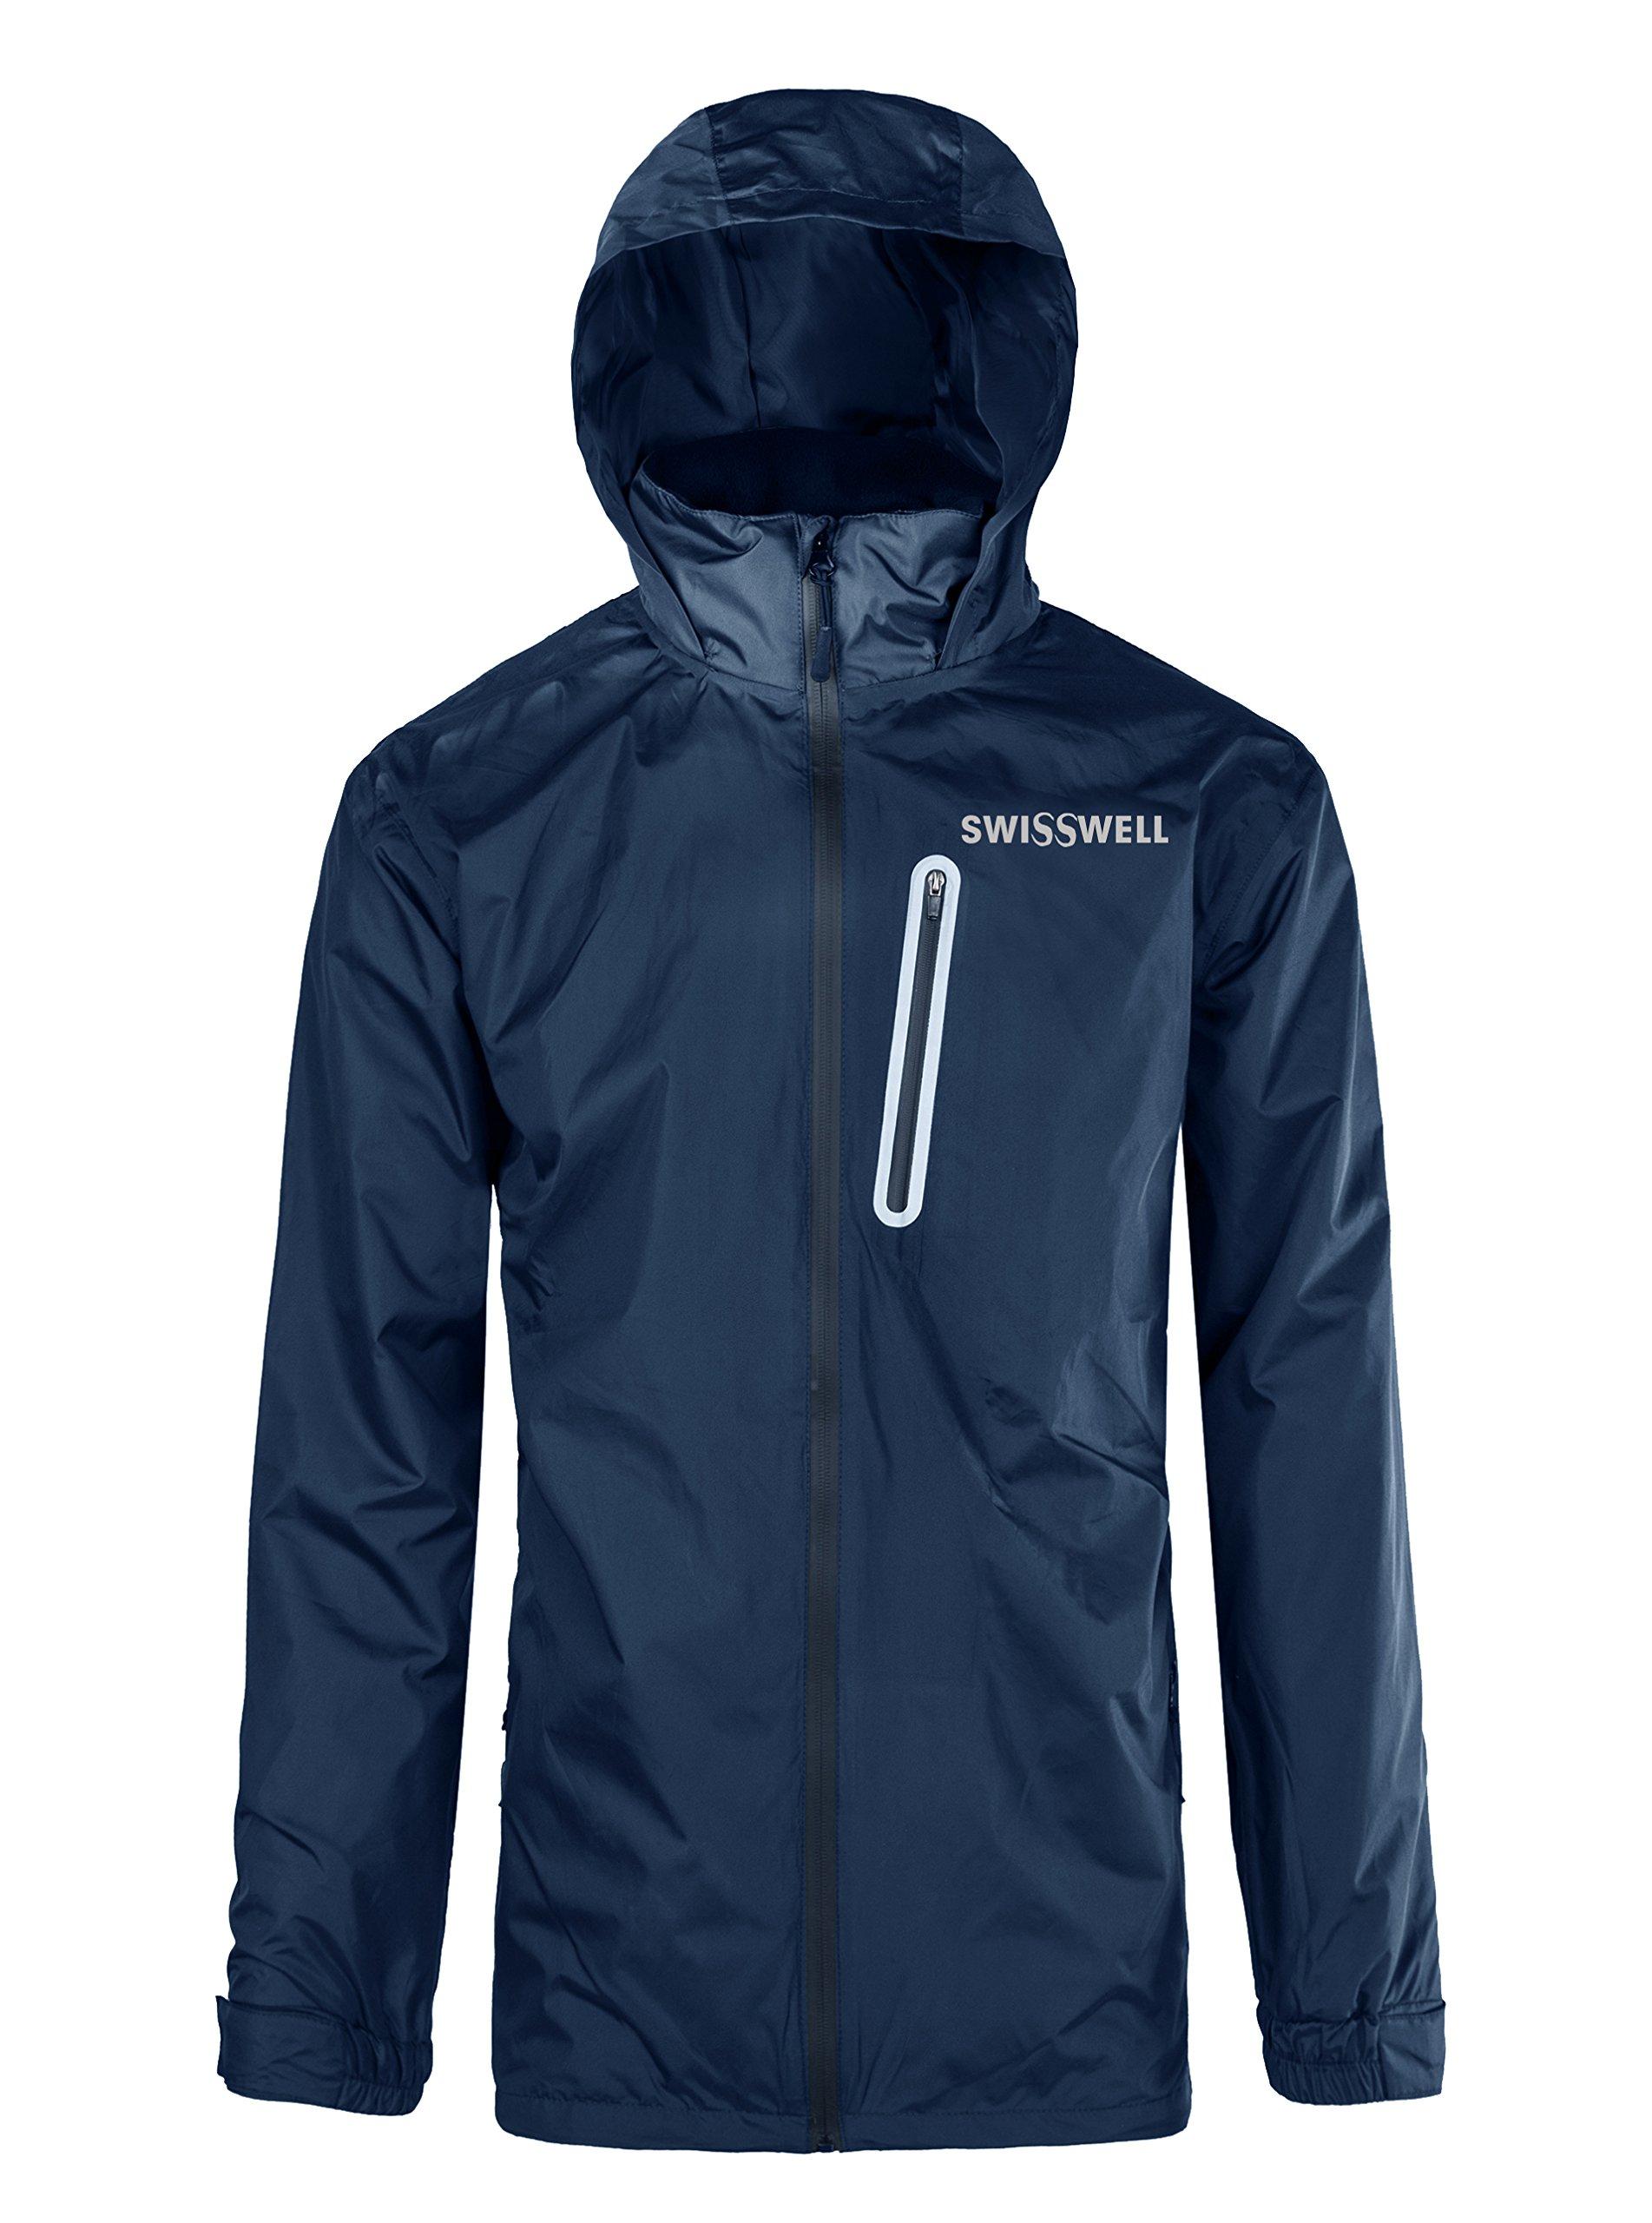 SWISSWELL Hooded Rain Jakcet for Mens Navy Blue Medium